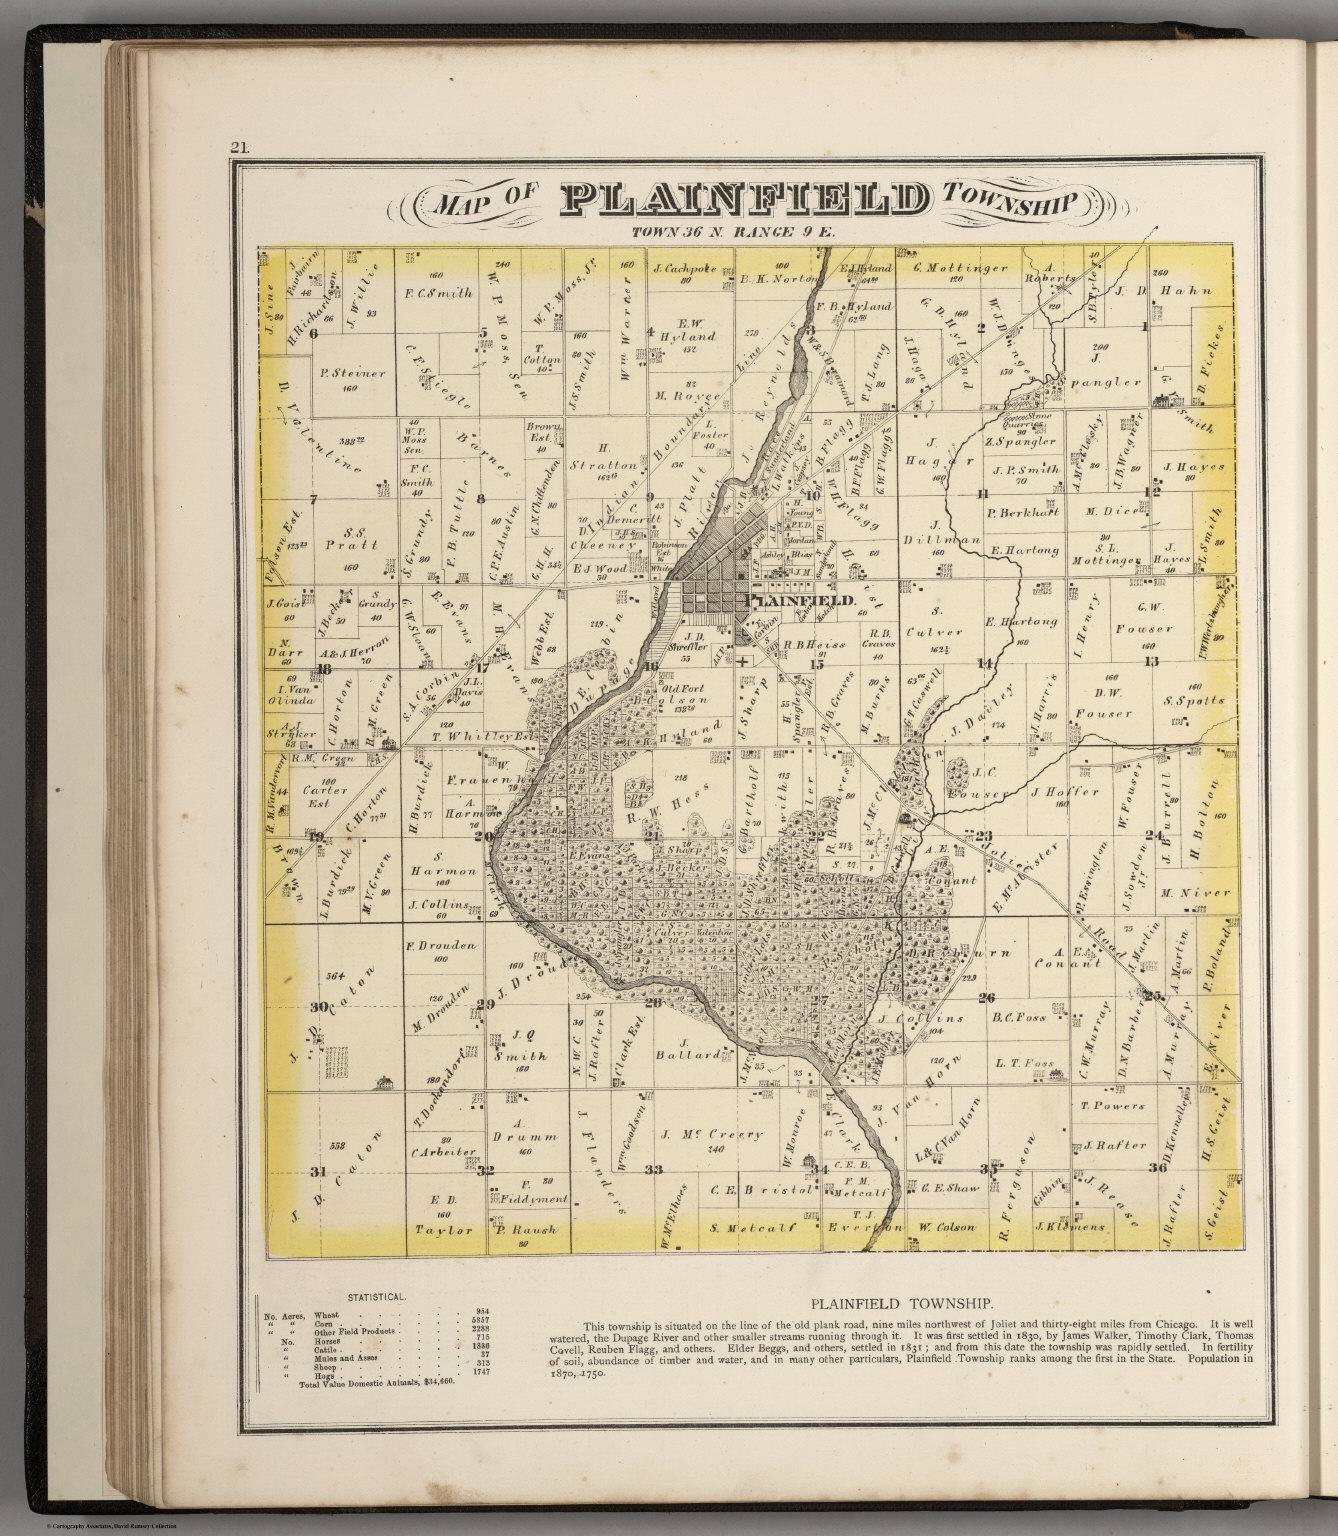 Plainfield Township Town 36 N Range 9 E Will County Illinois